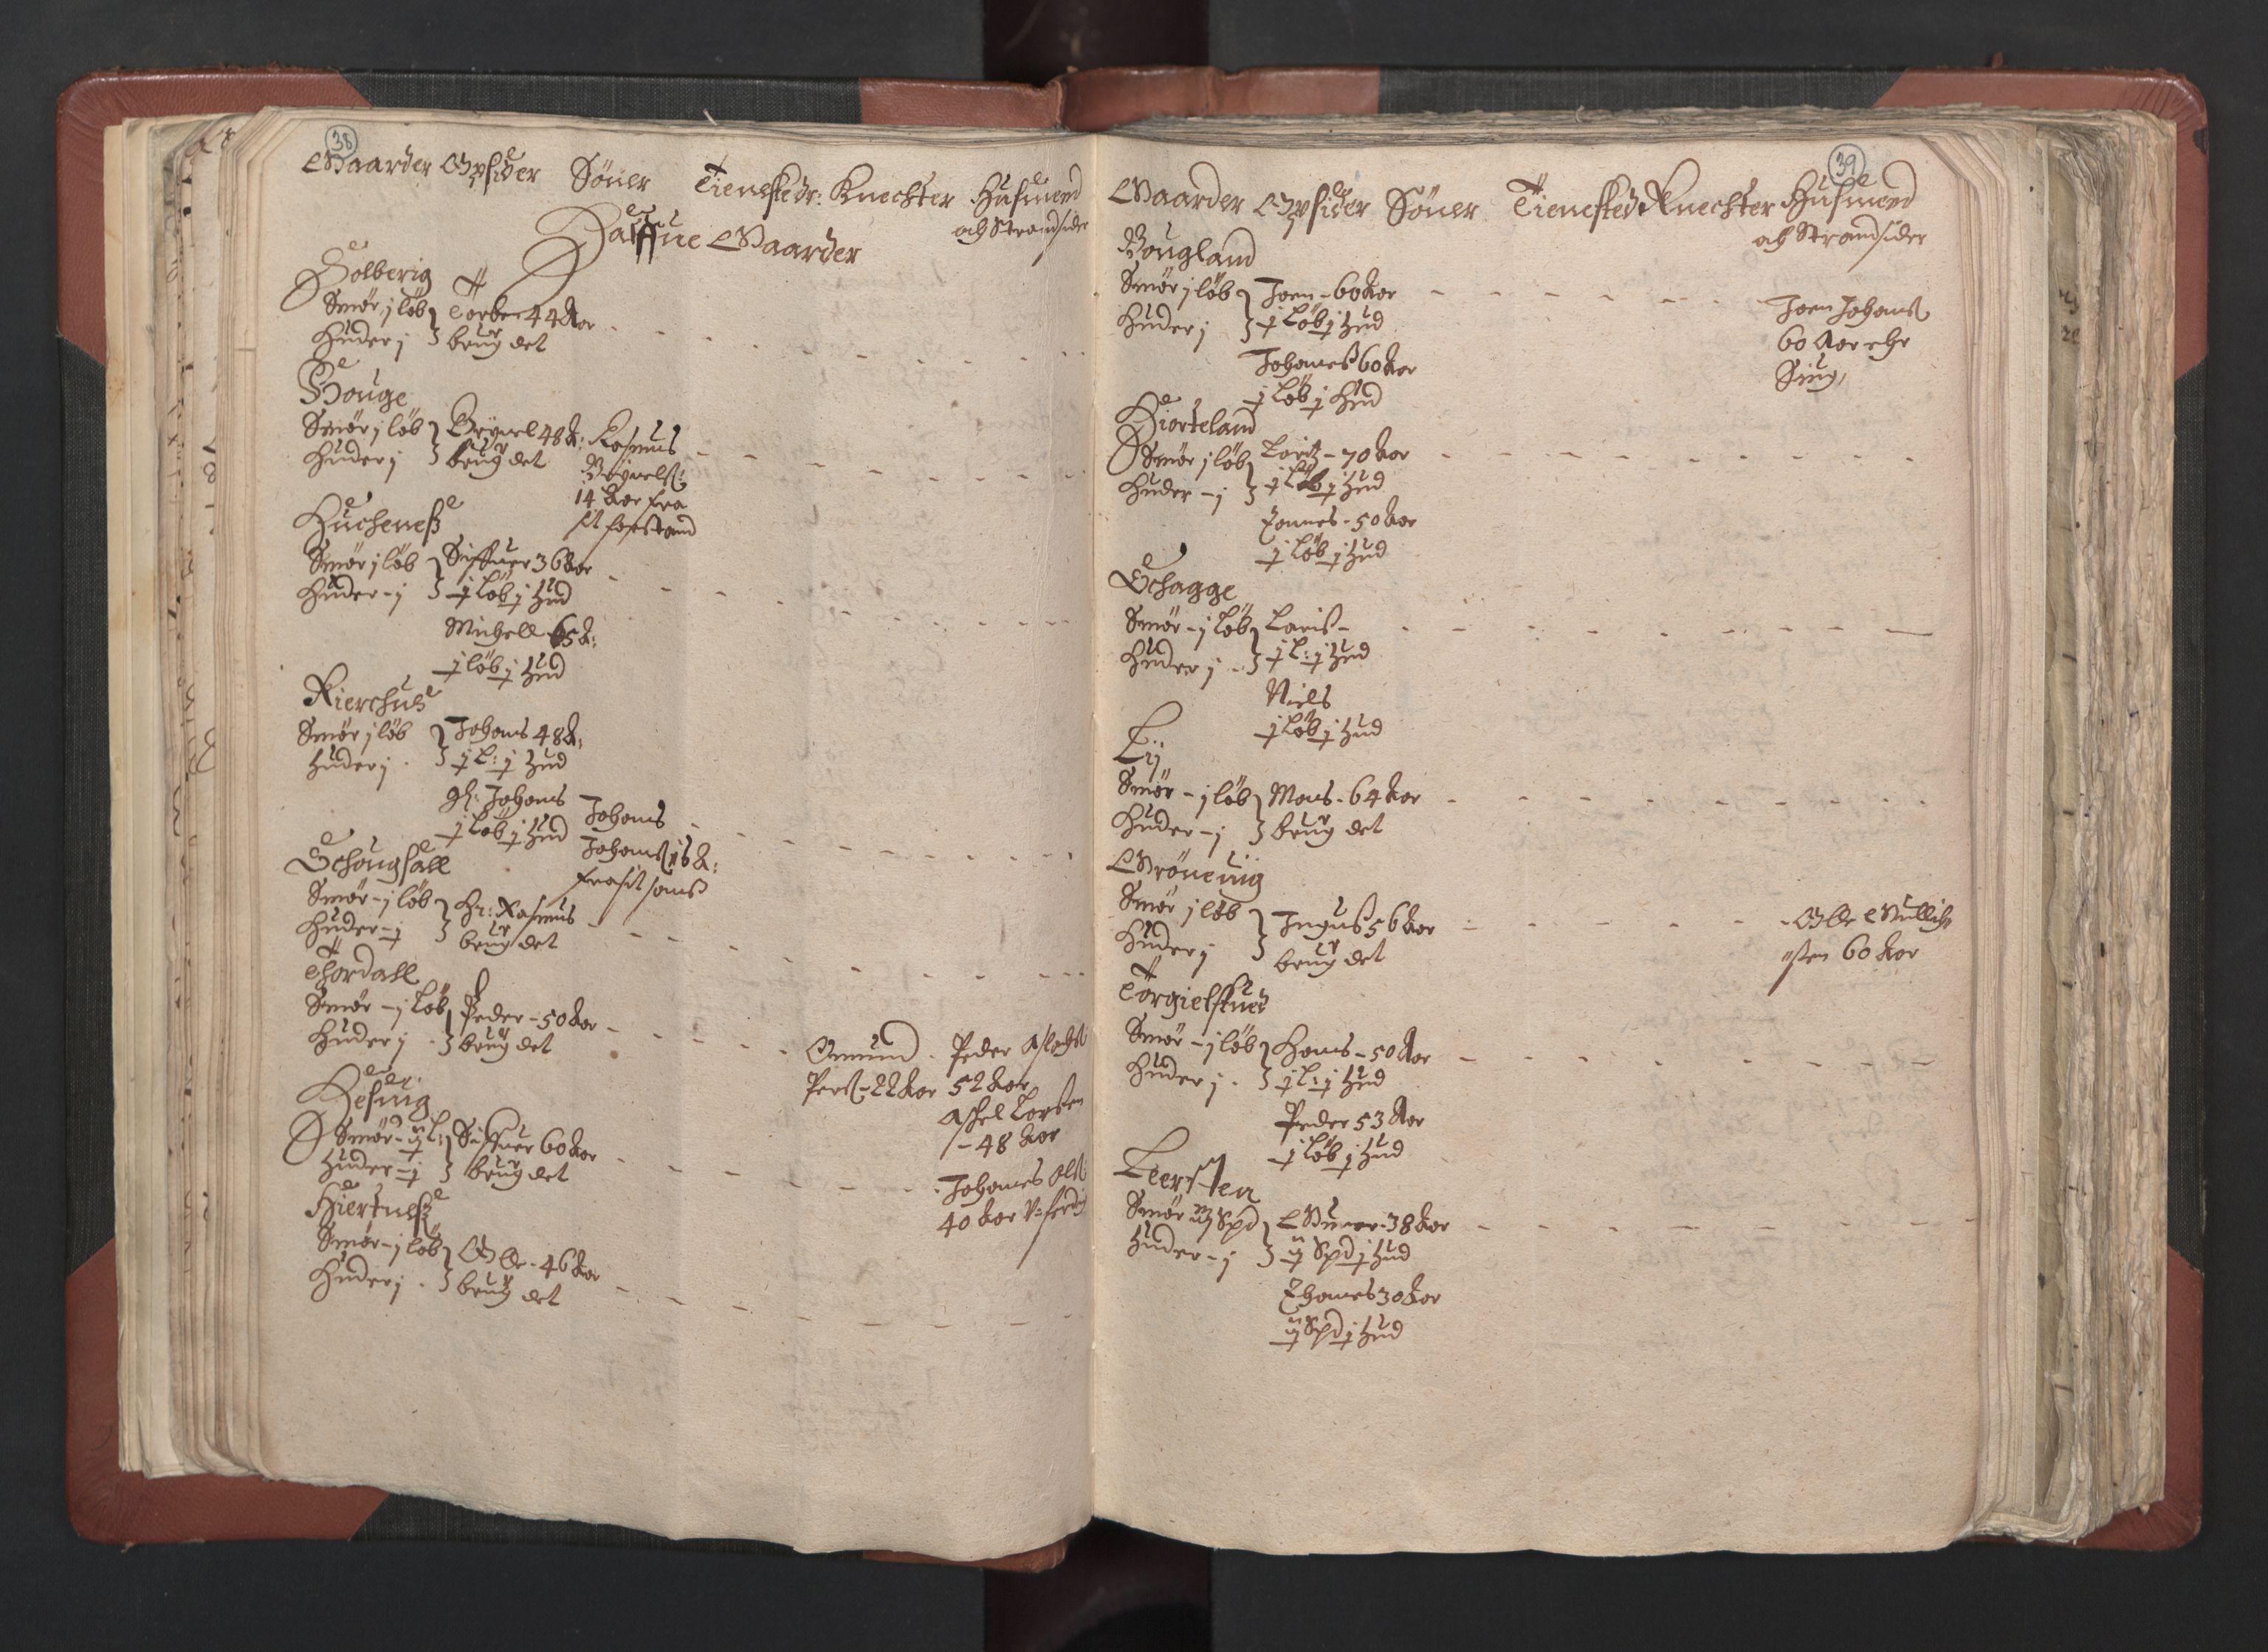 RA, Bailiff's Census 1664-1666, no. 13: Nordhordland fogderi and Sunnhordland fogderi, 1665, p. 38-39